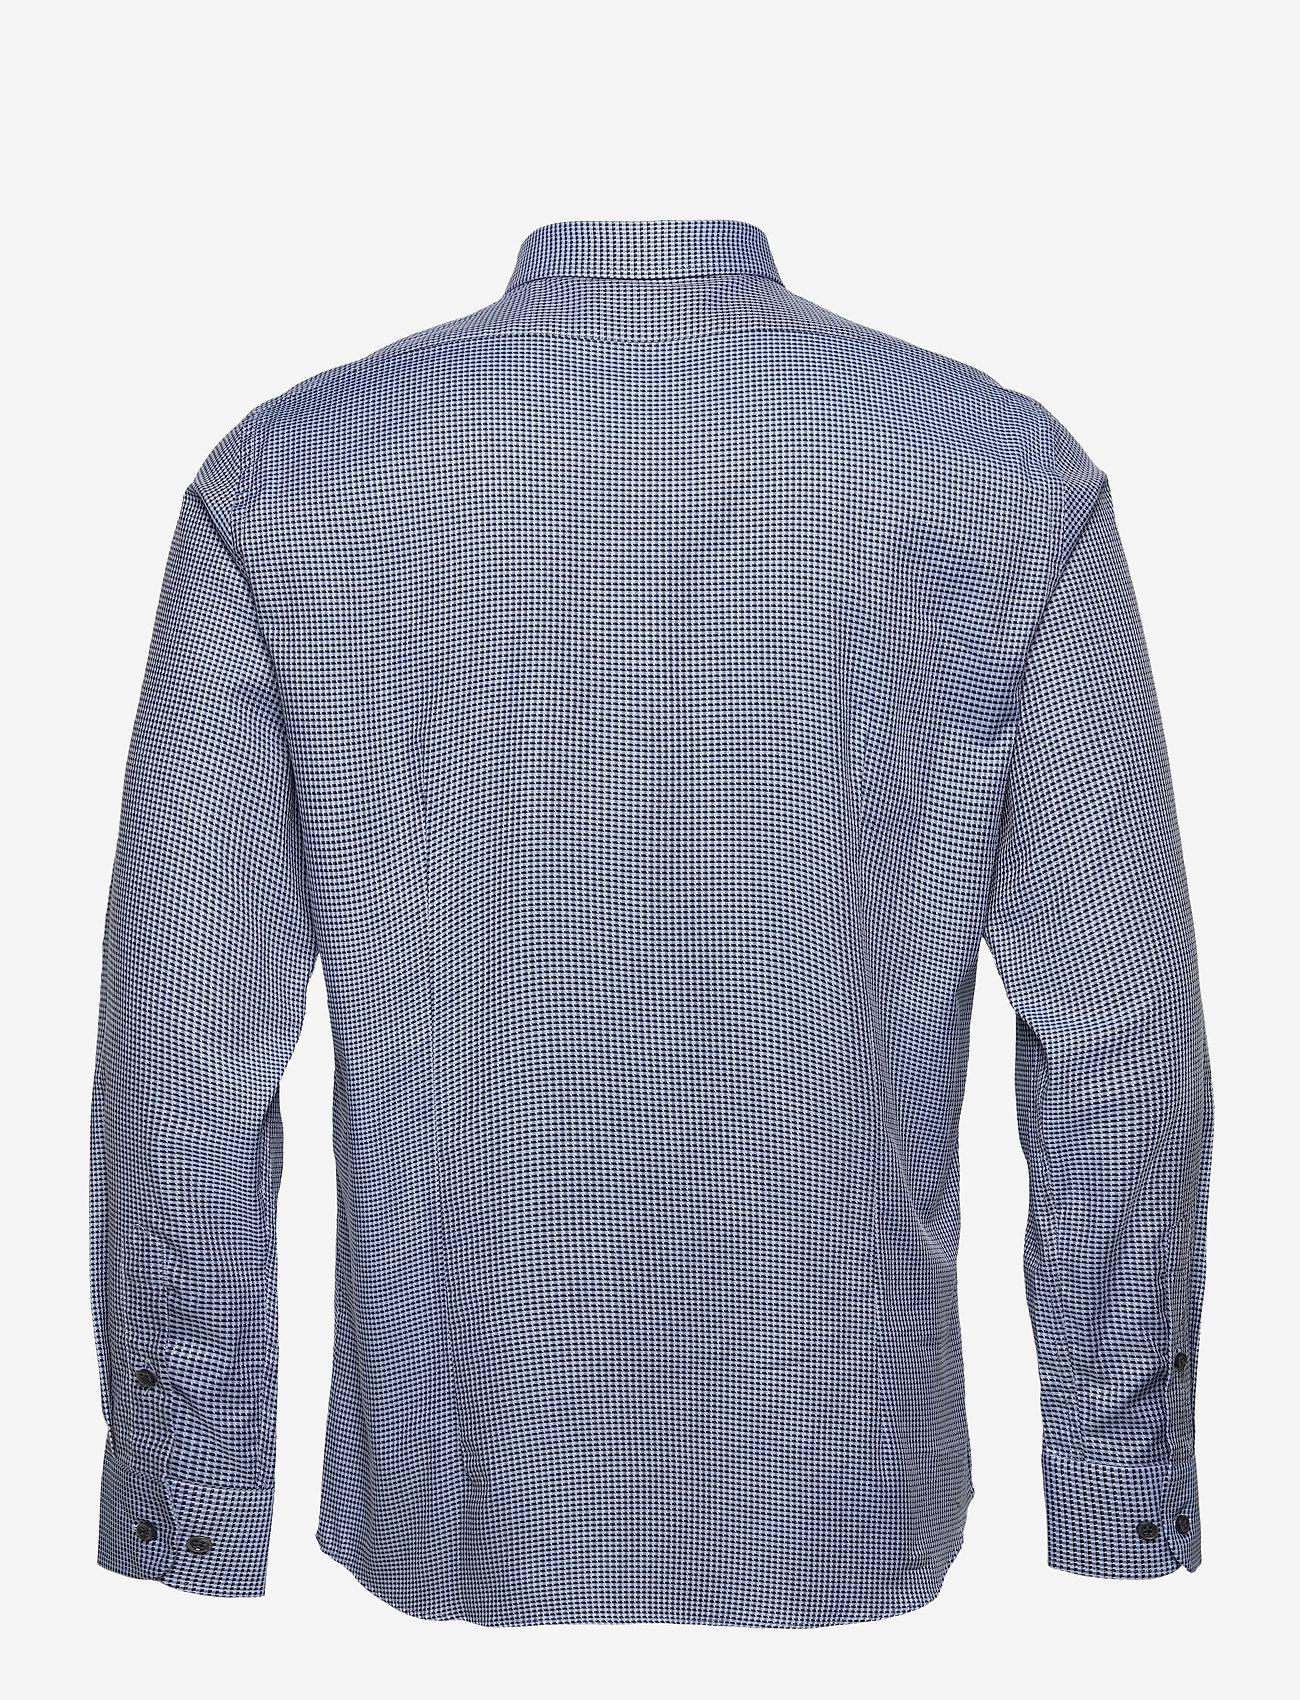 SAND - 8650 - State N 2 - basic skjortor - medium blue - 1